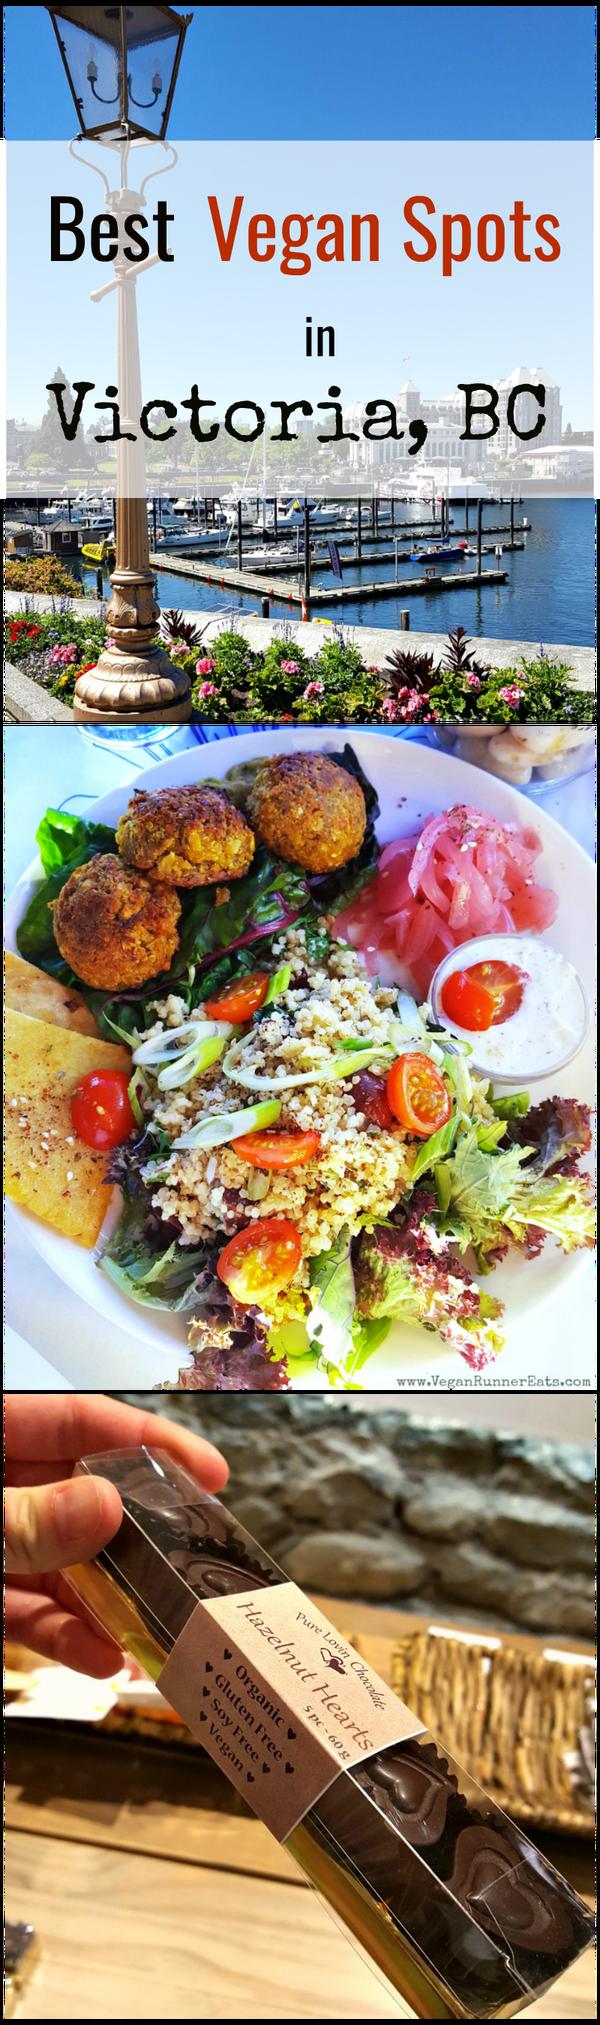 Best Vegan Restaurants And Shops In Victoria Bc Visiting Vancouver Island In British Columbia Check Ou Vegan Restaurants Best Vegan Restaurants Vegan Travel